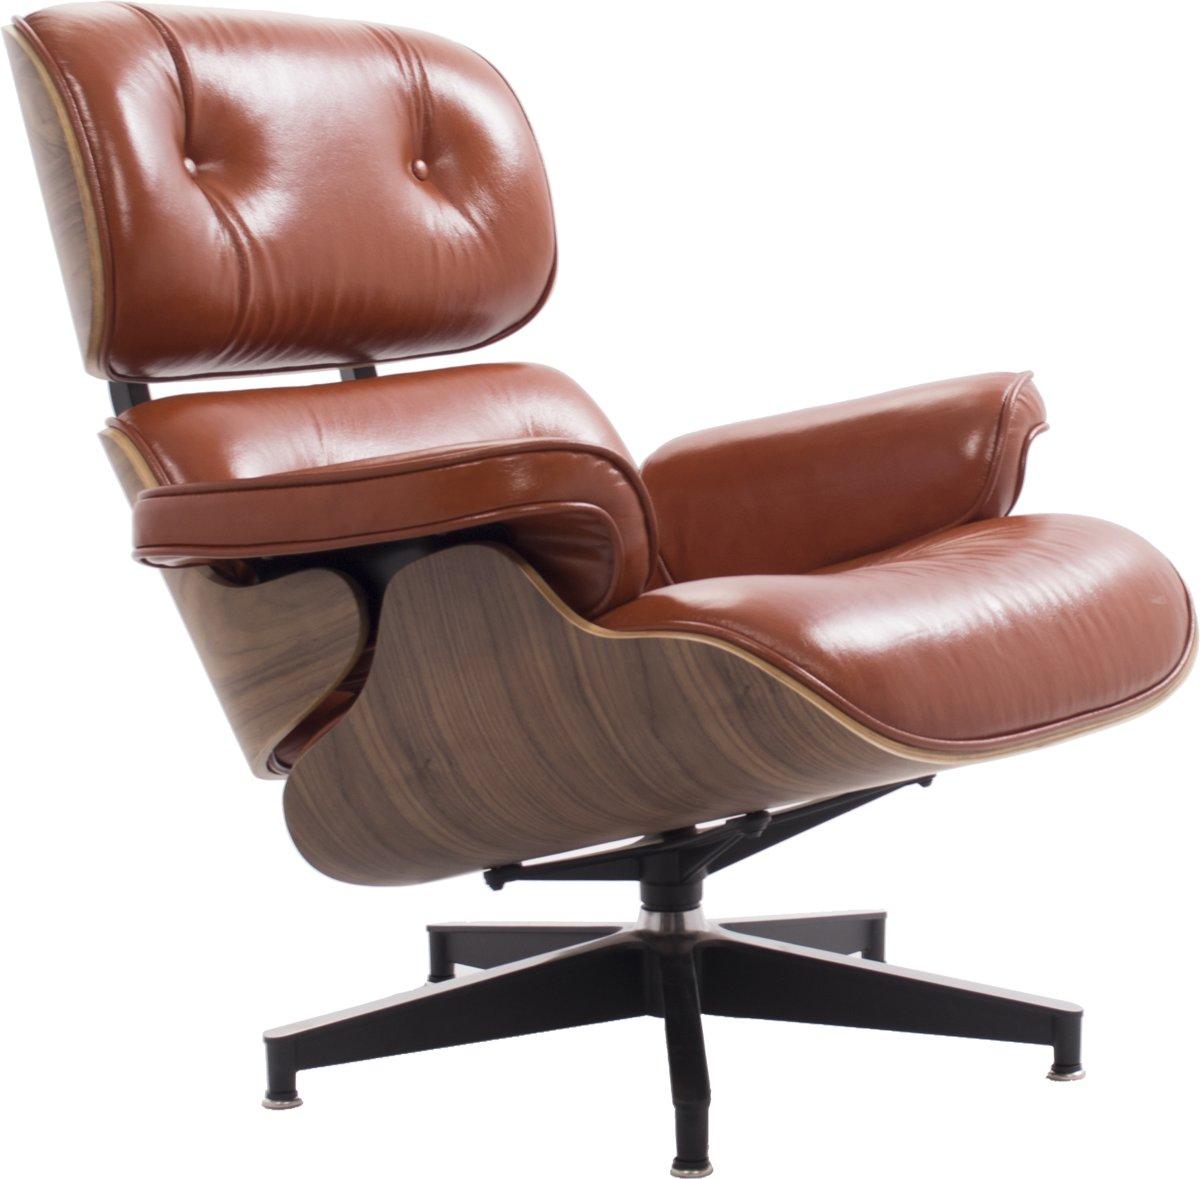 lounge stoel Lounge tan kopen